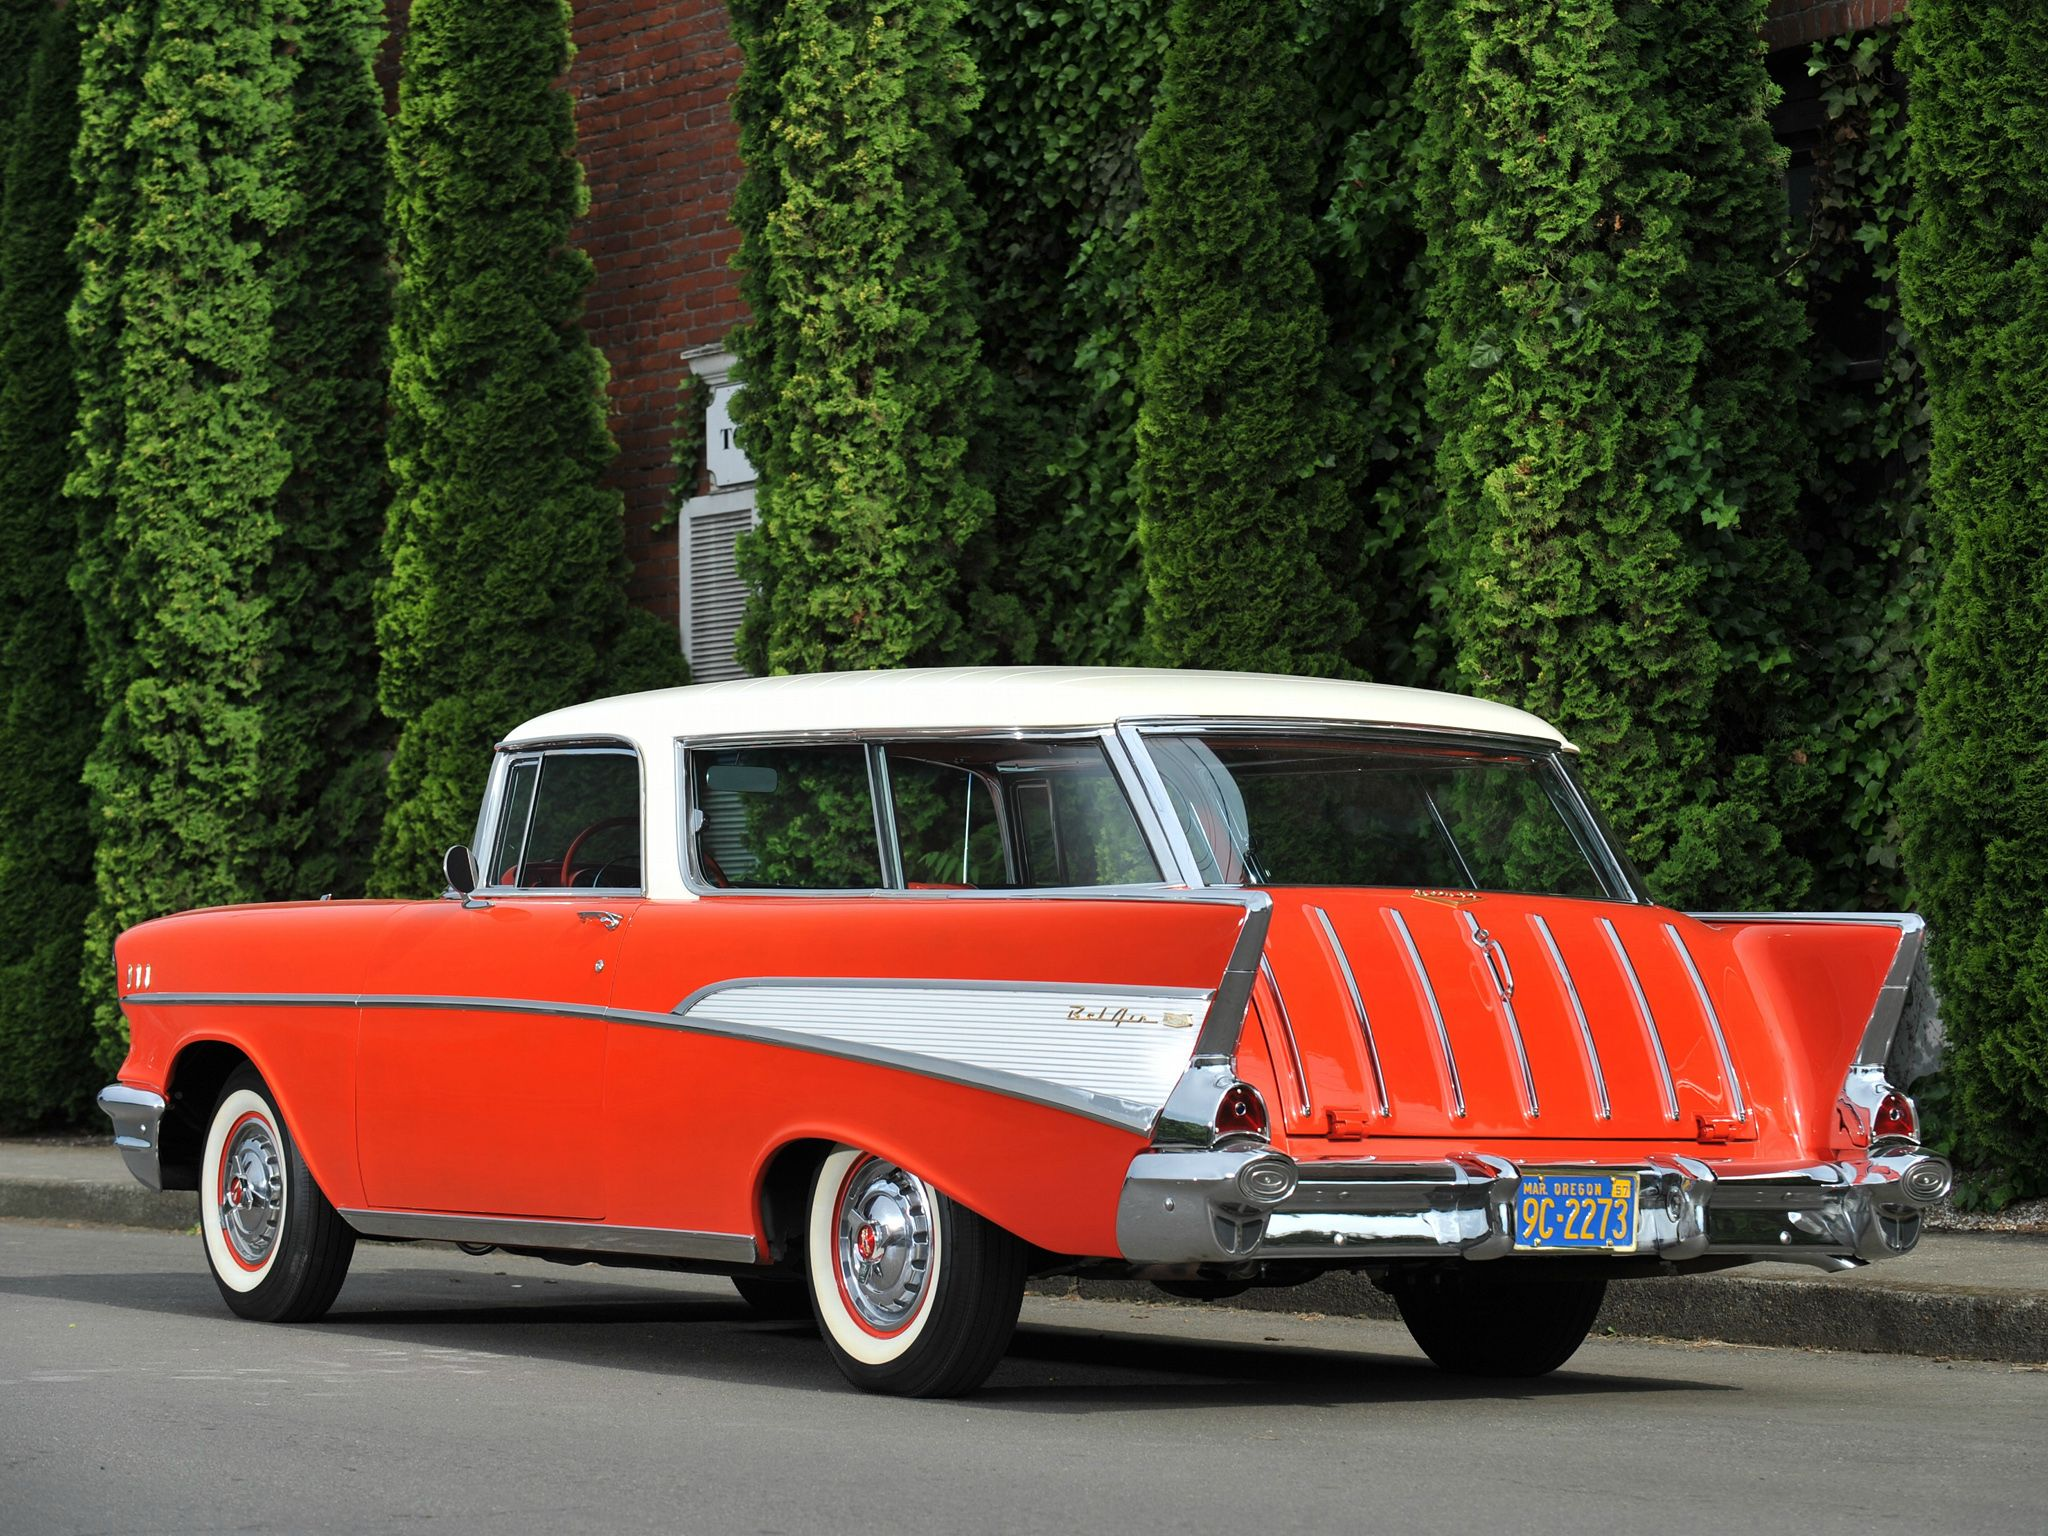 1957 Chevrolet Bel Air Nomad Chevrolet Bel Air 1957 Chevrolet